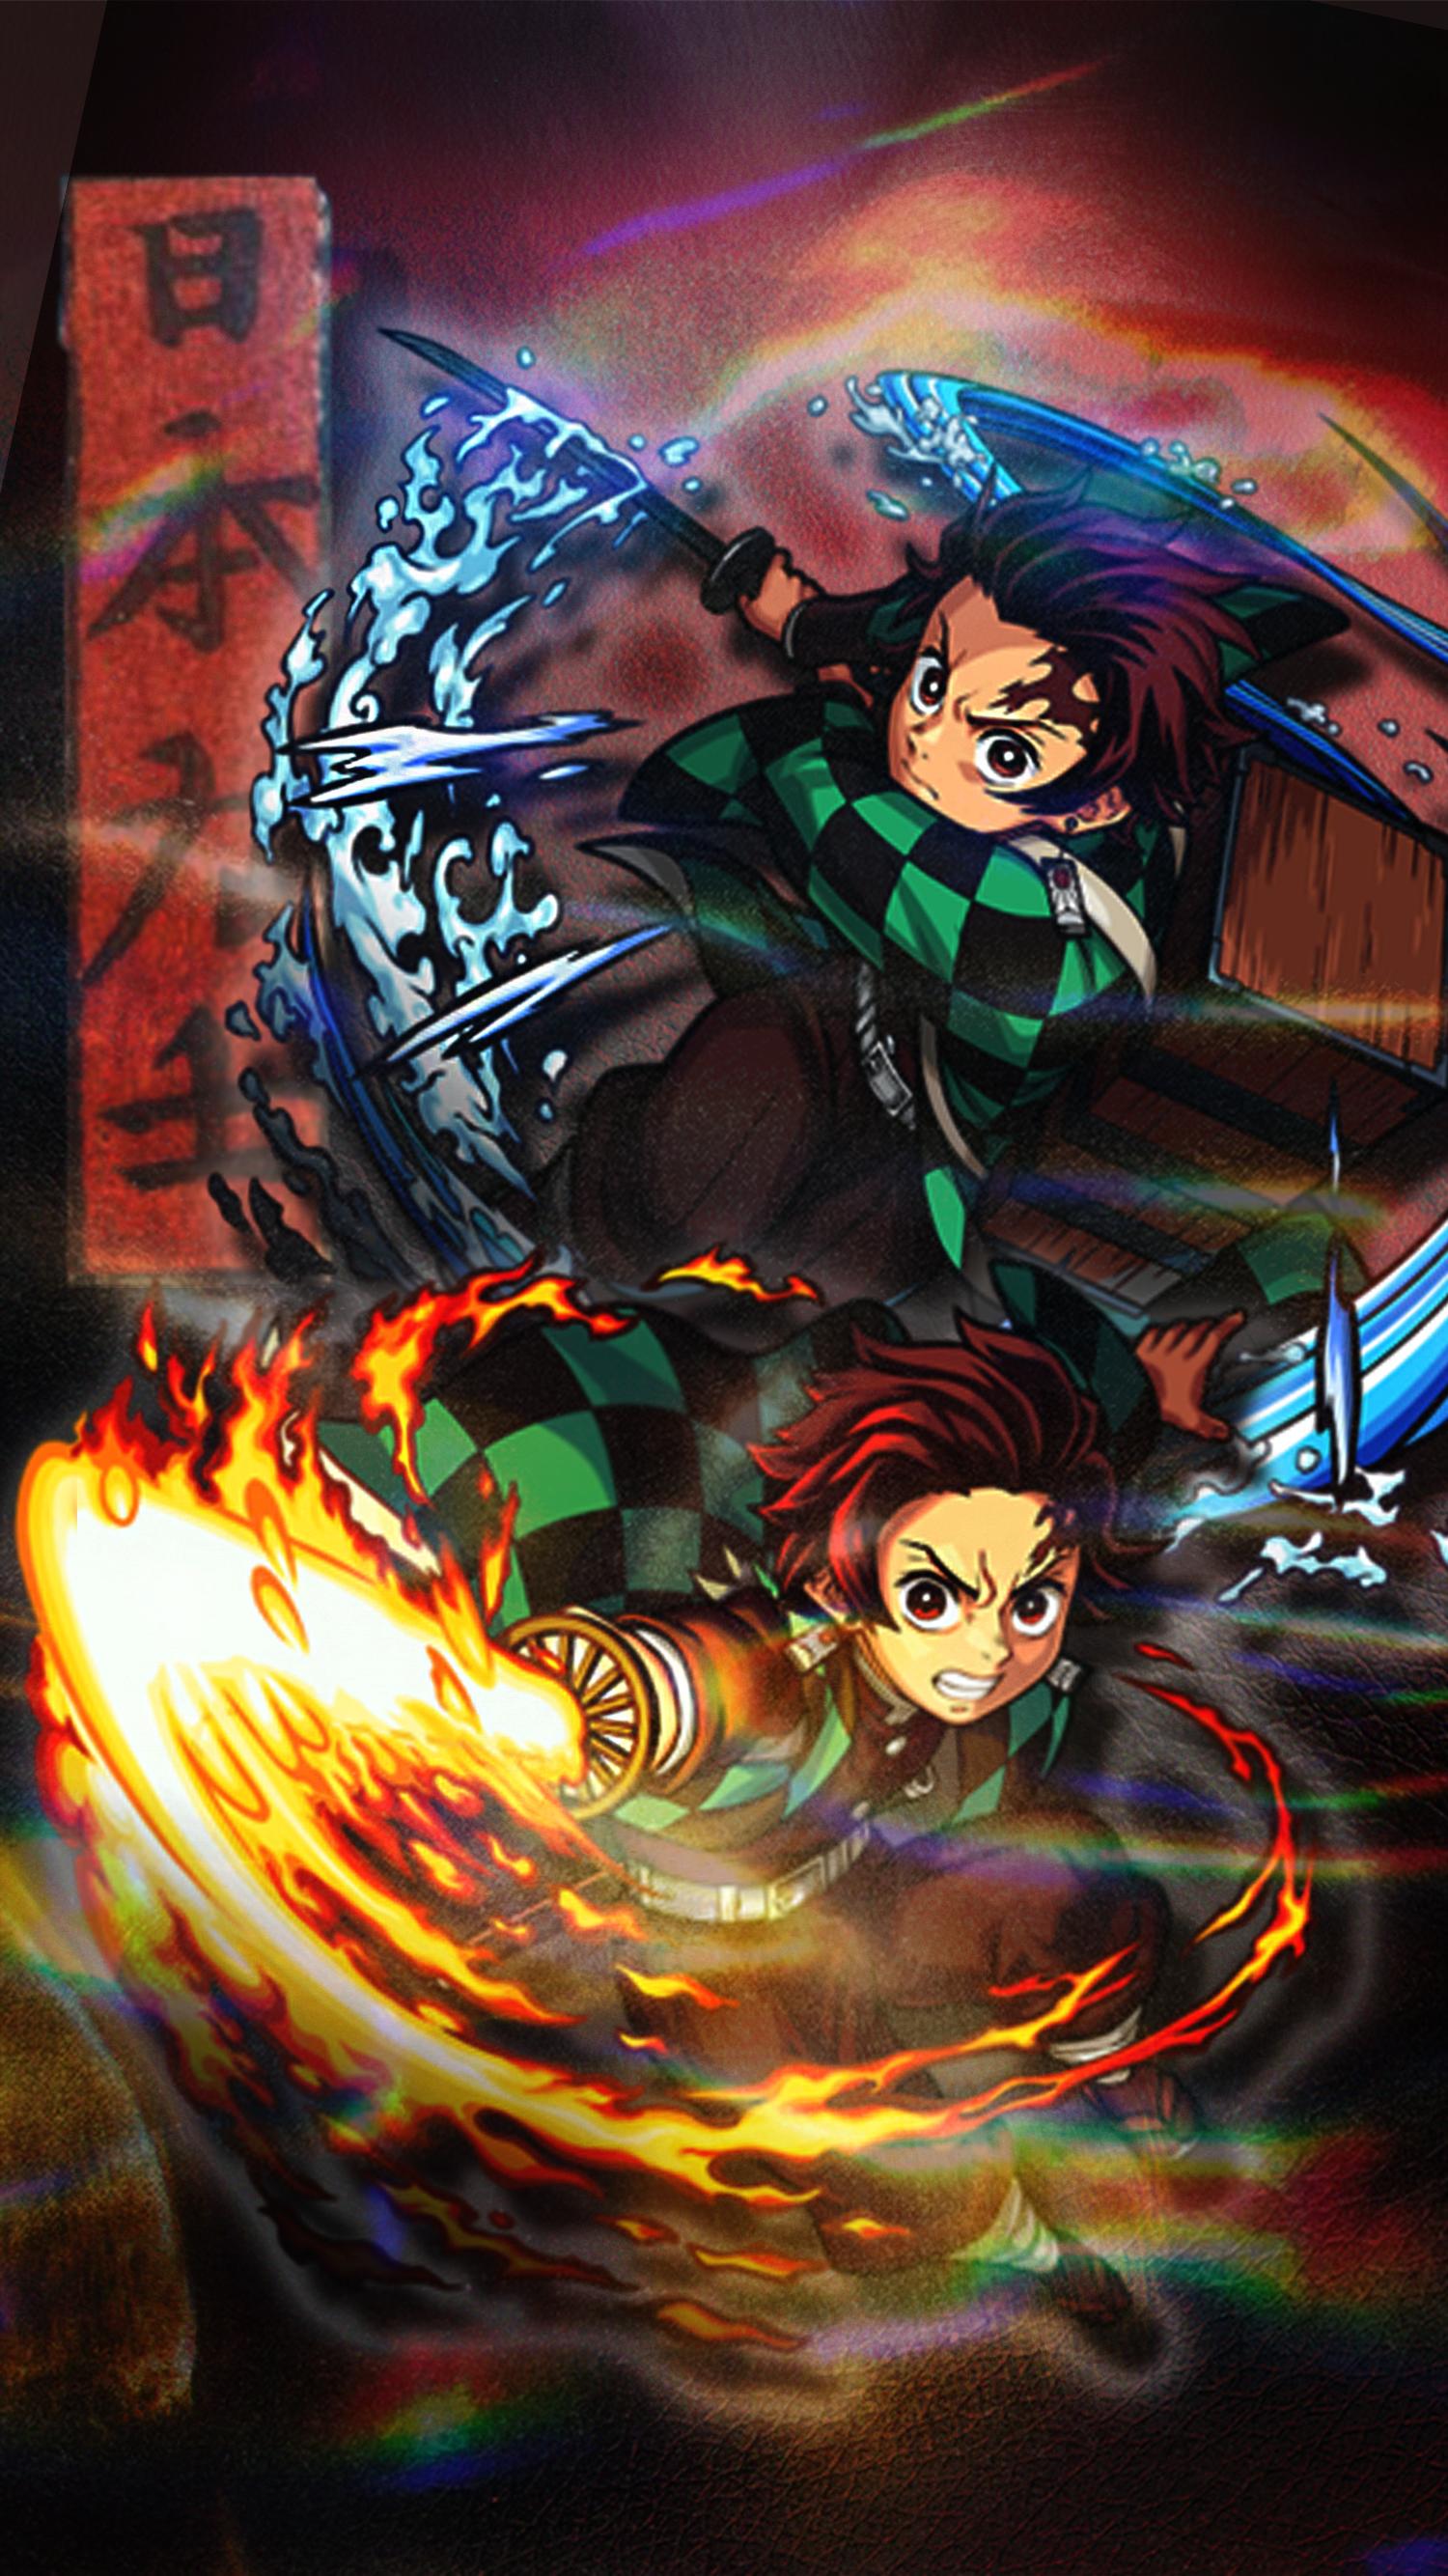 Demon Slayer Wallpaper Iphone - Anime ...